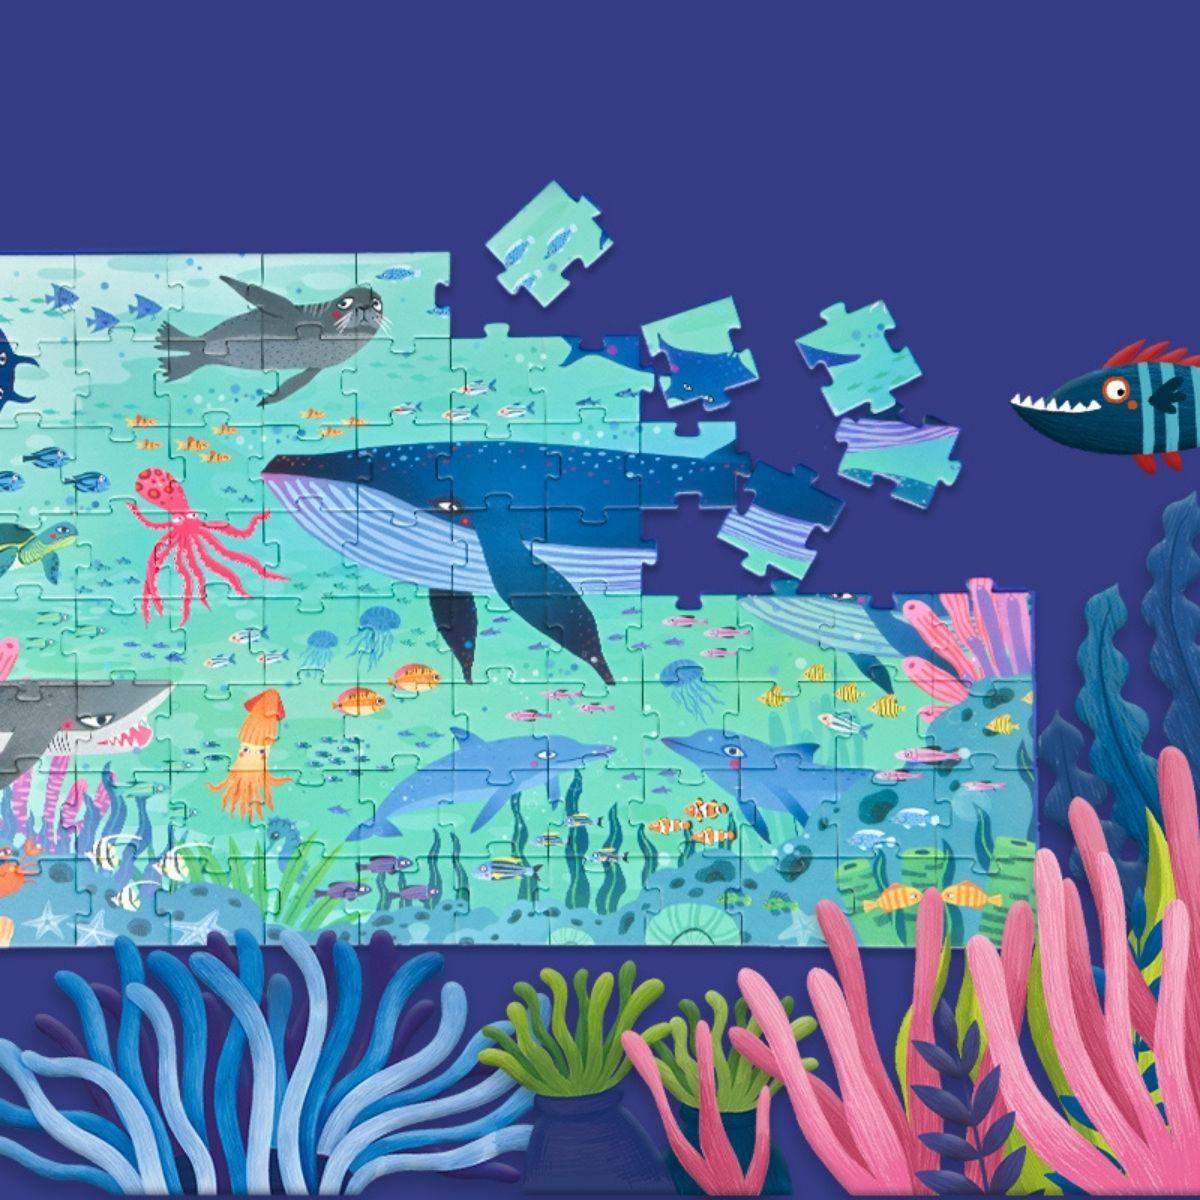 Brinquedo Educativo Quebra Cabeça - Oceano Maravilhoso